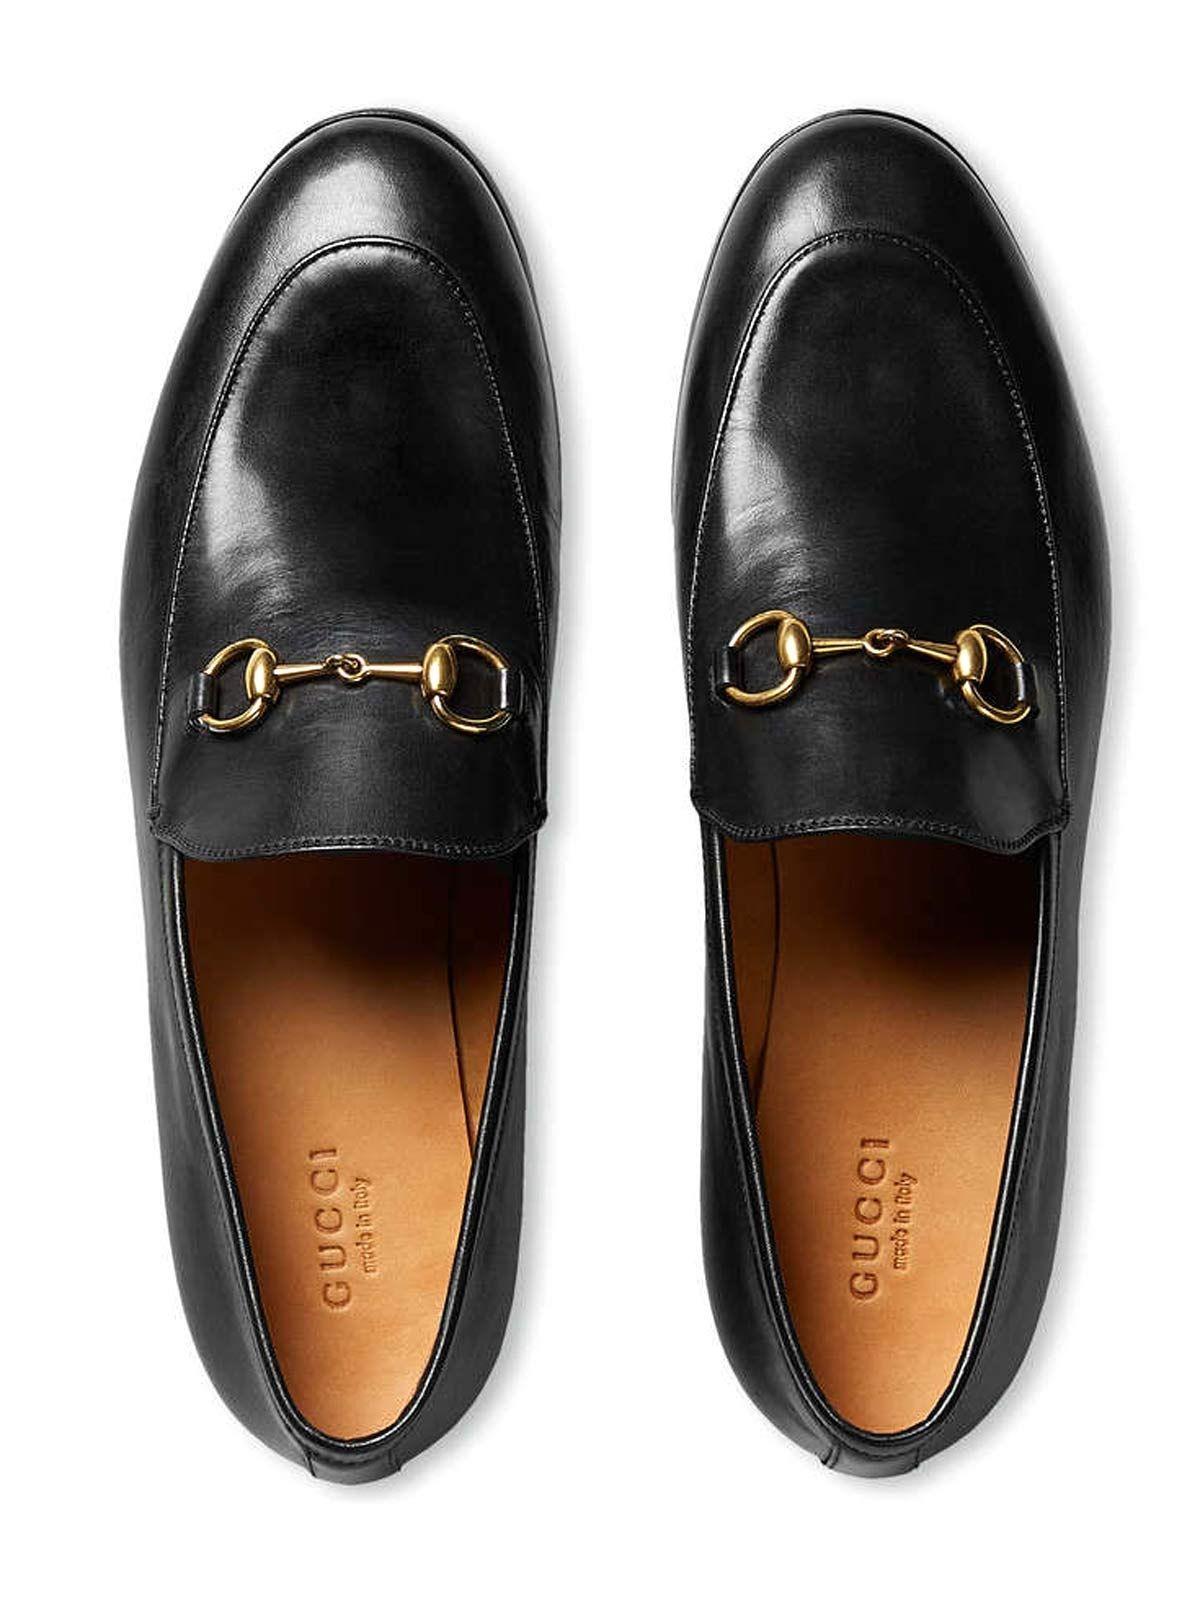 5124ffddea Mocassim Gucci Jordaan Loafer - Gucci Sapatos